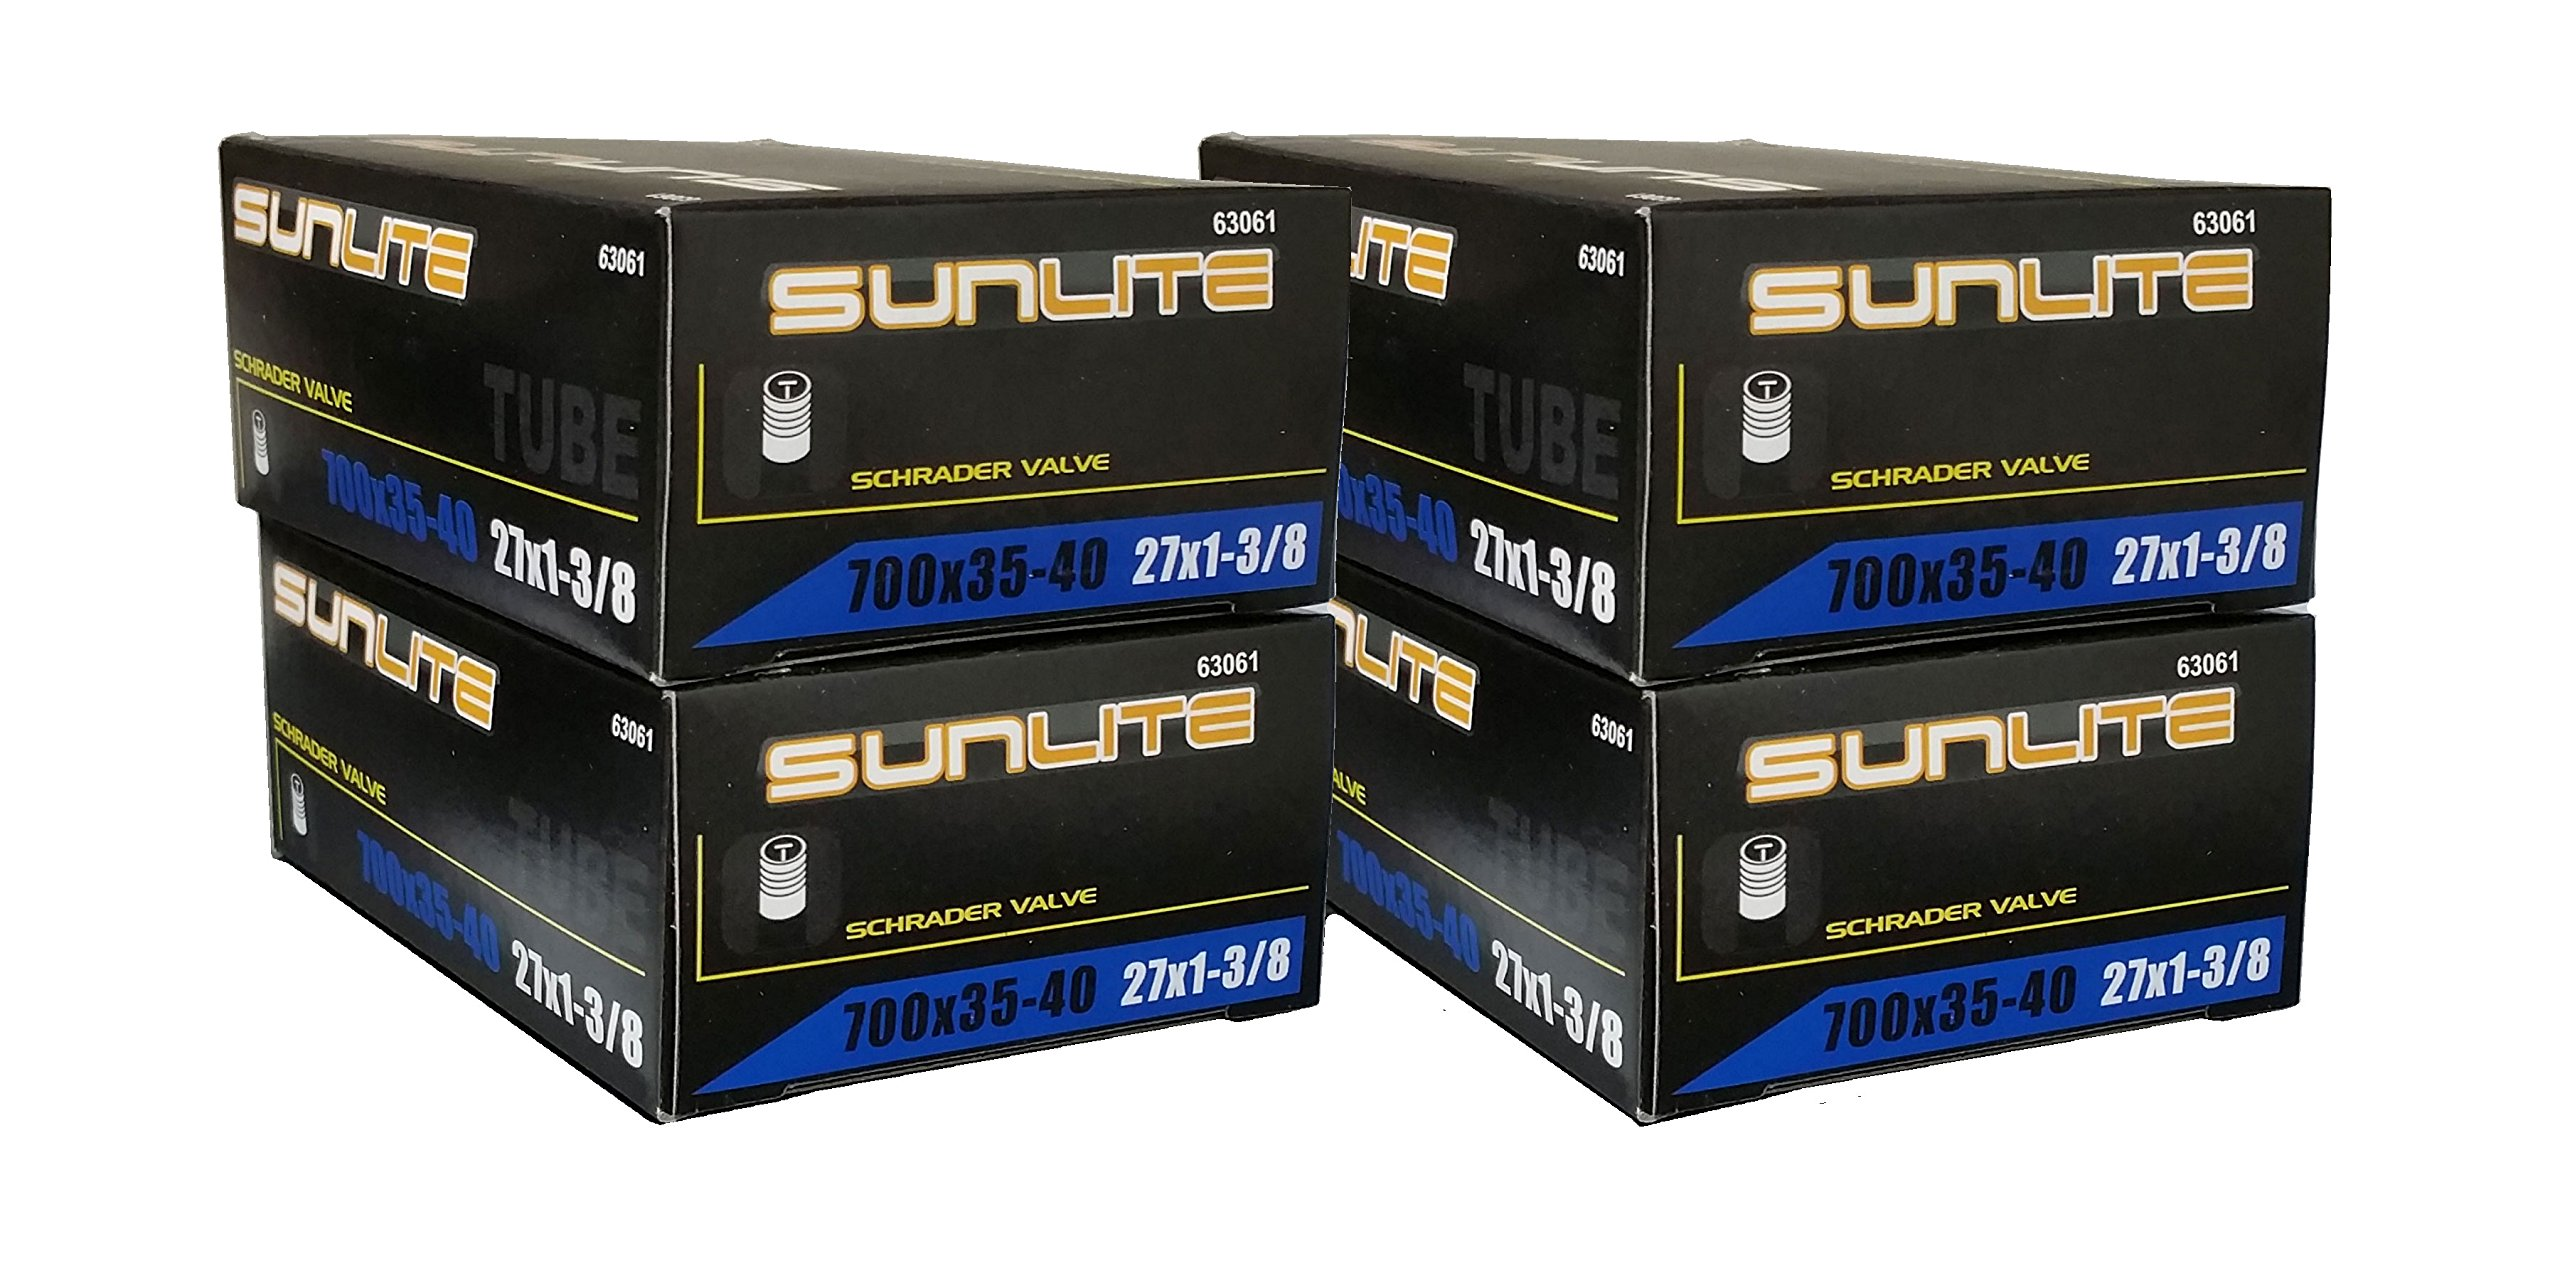 GET ONE FREE 4 PACK DEAL - Tube, 700 x 35-40 (27 x 1-3/8) SCHRADER Valve 32mm, Sunlite